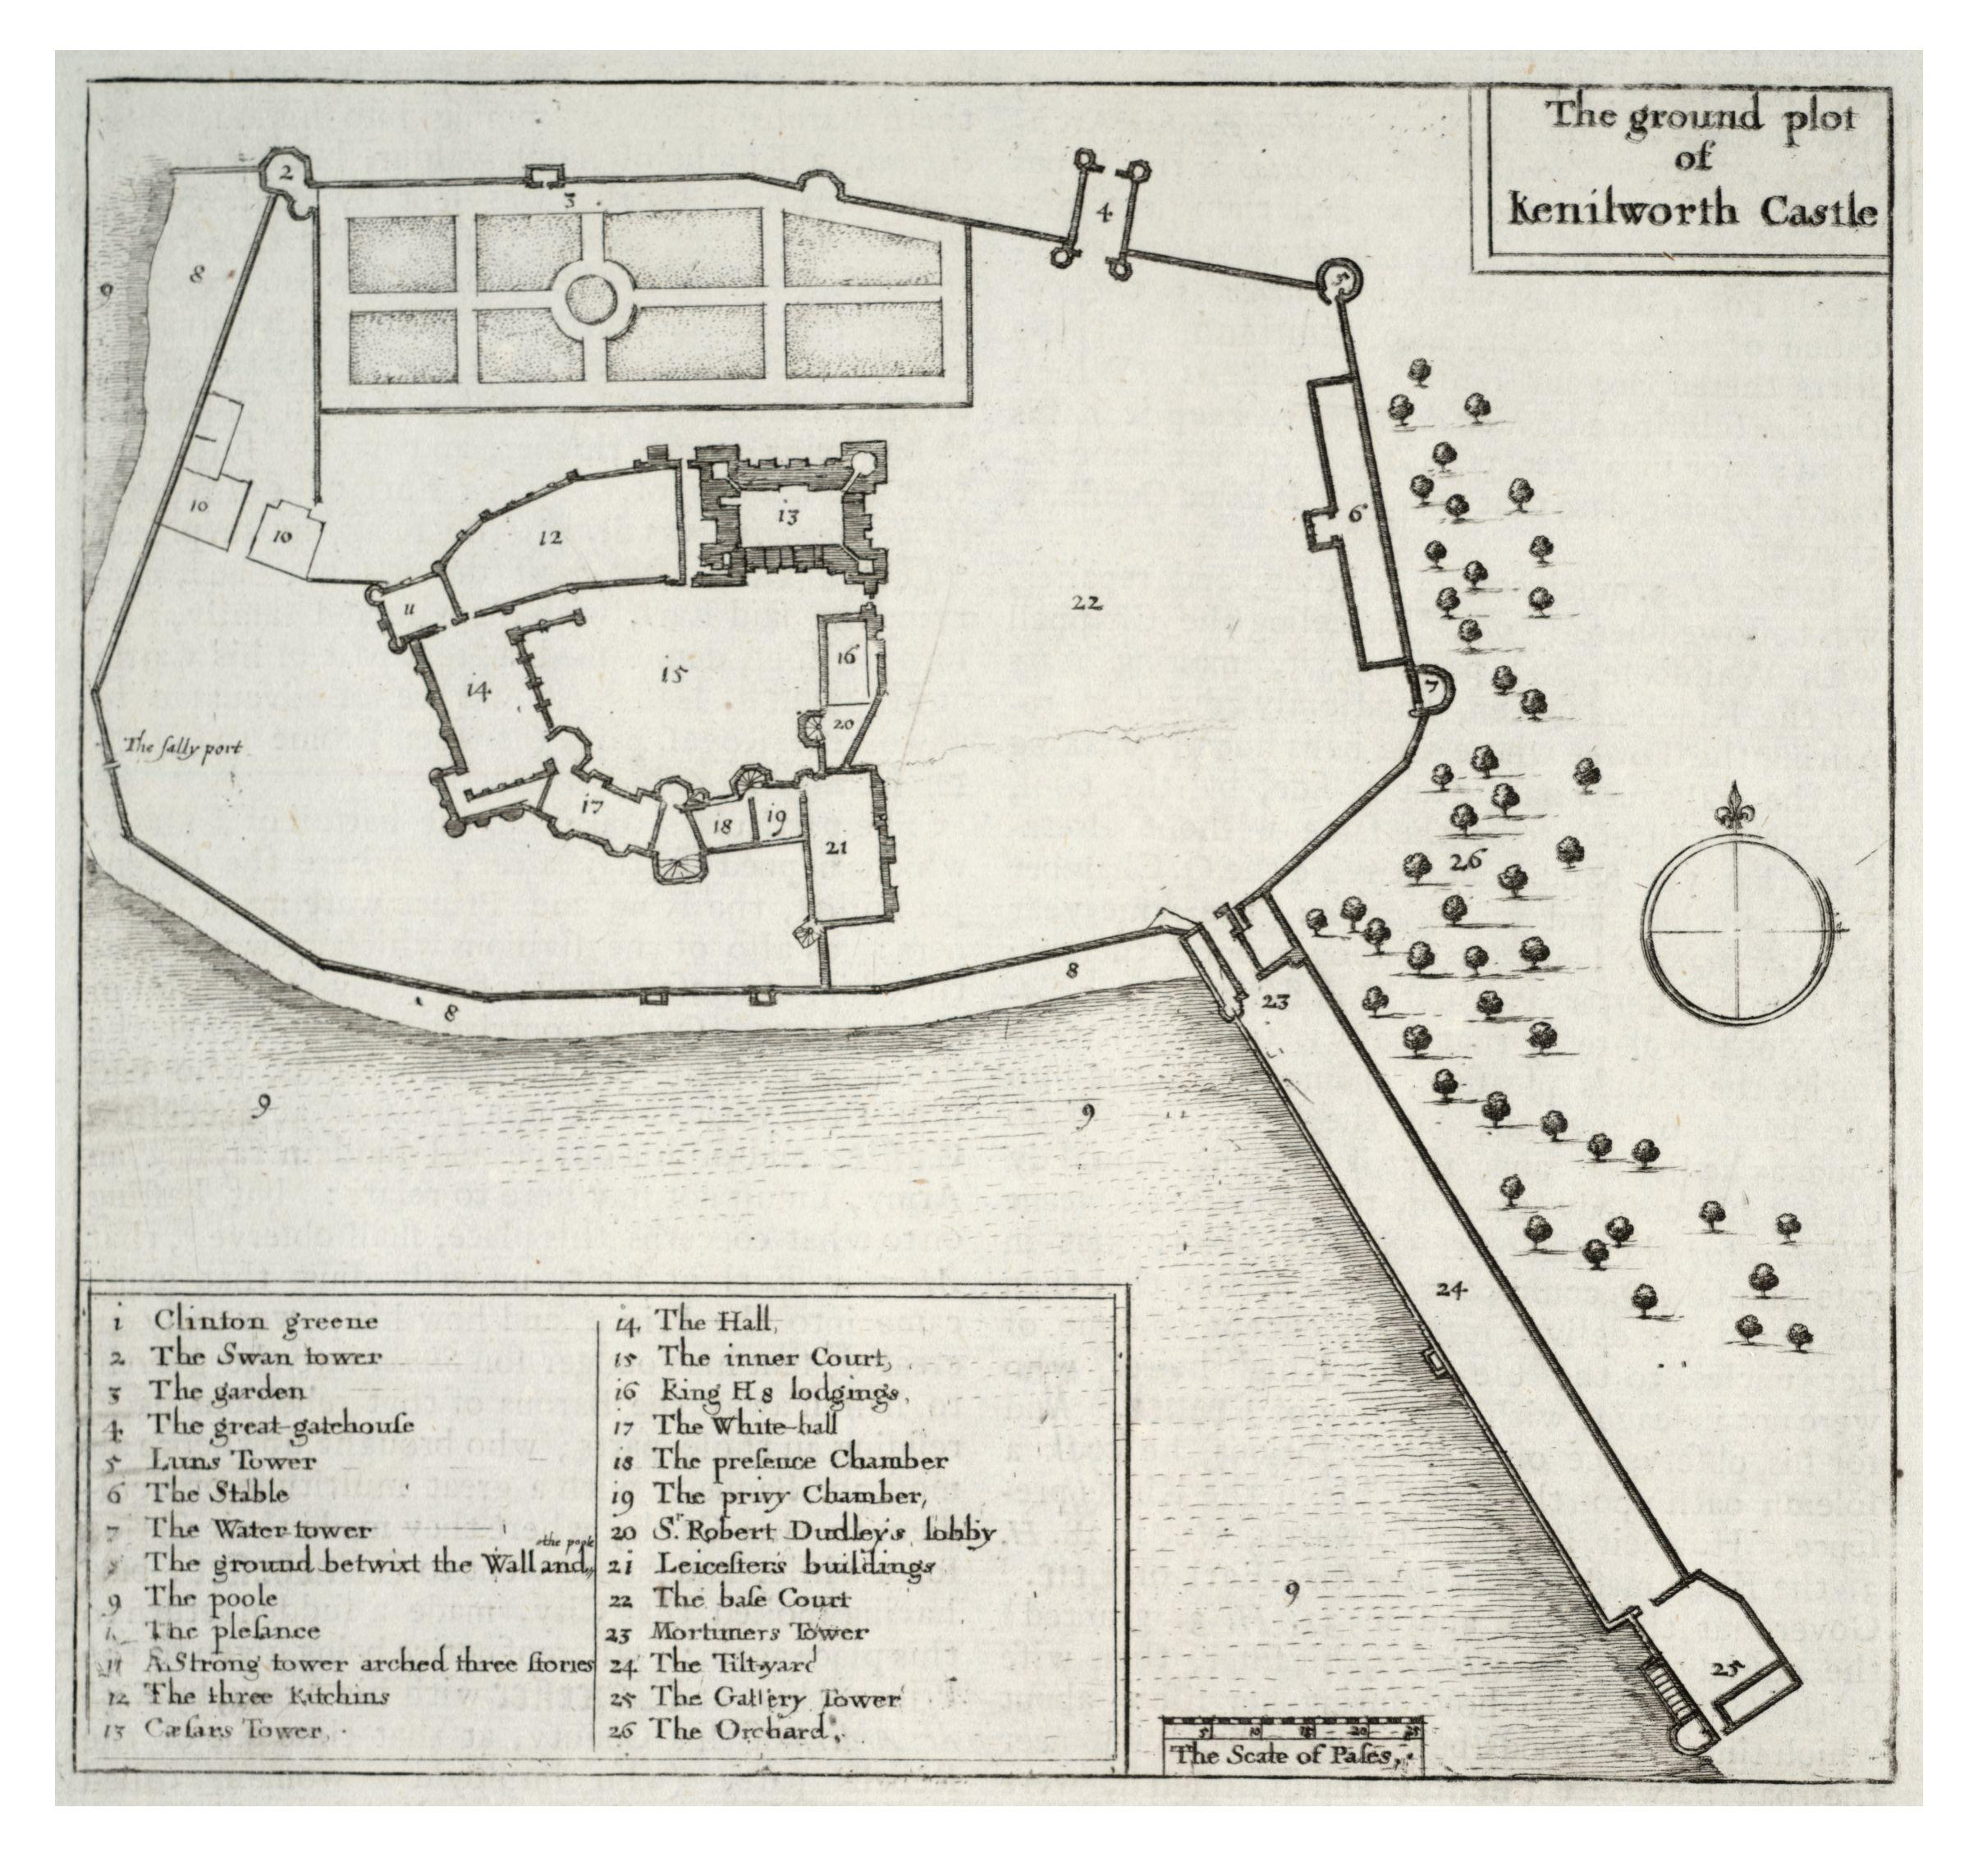 kenilworth castle military wiki fandom powered by wikia wenceslas hollar kenilworth castle plan